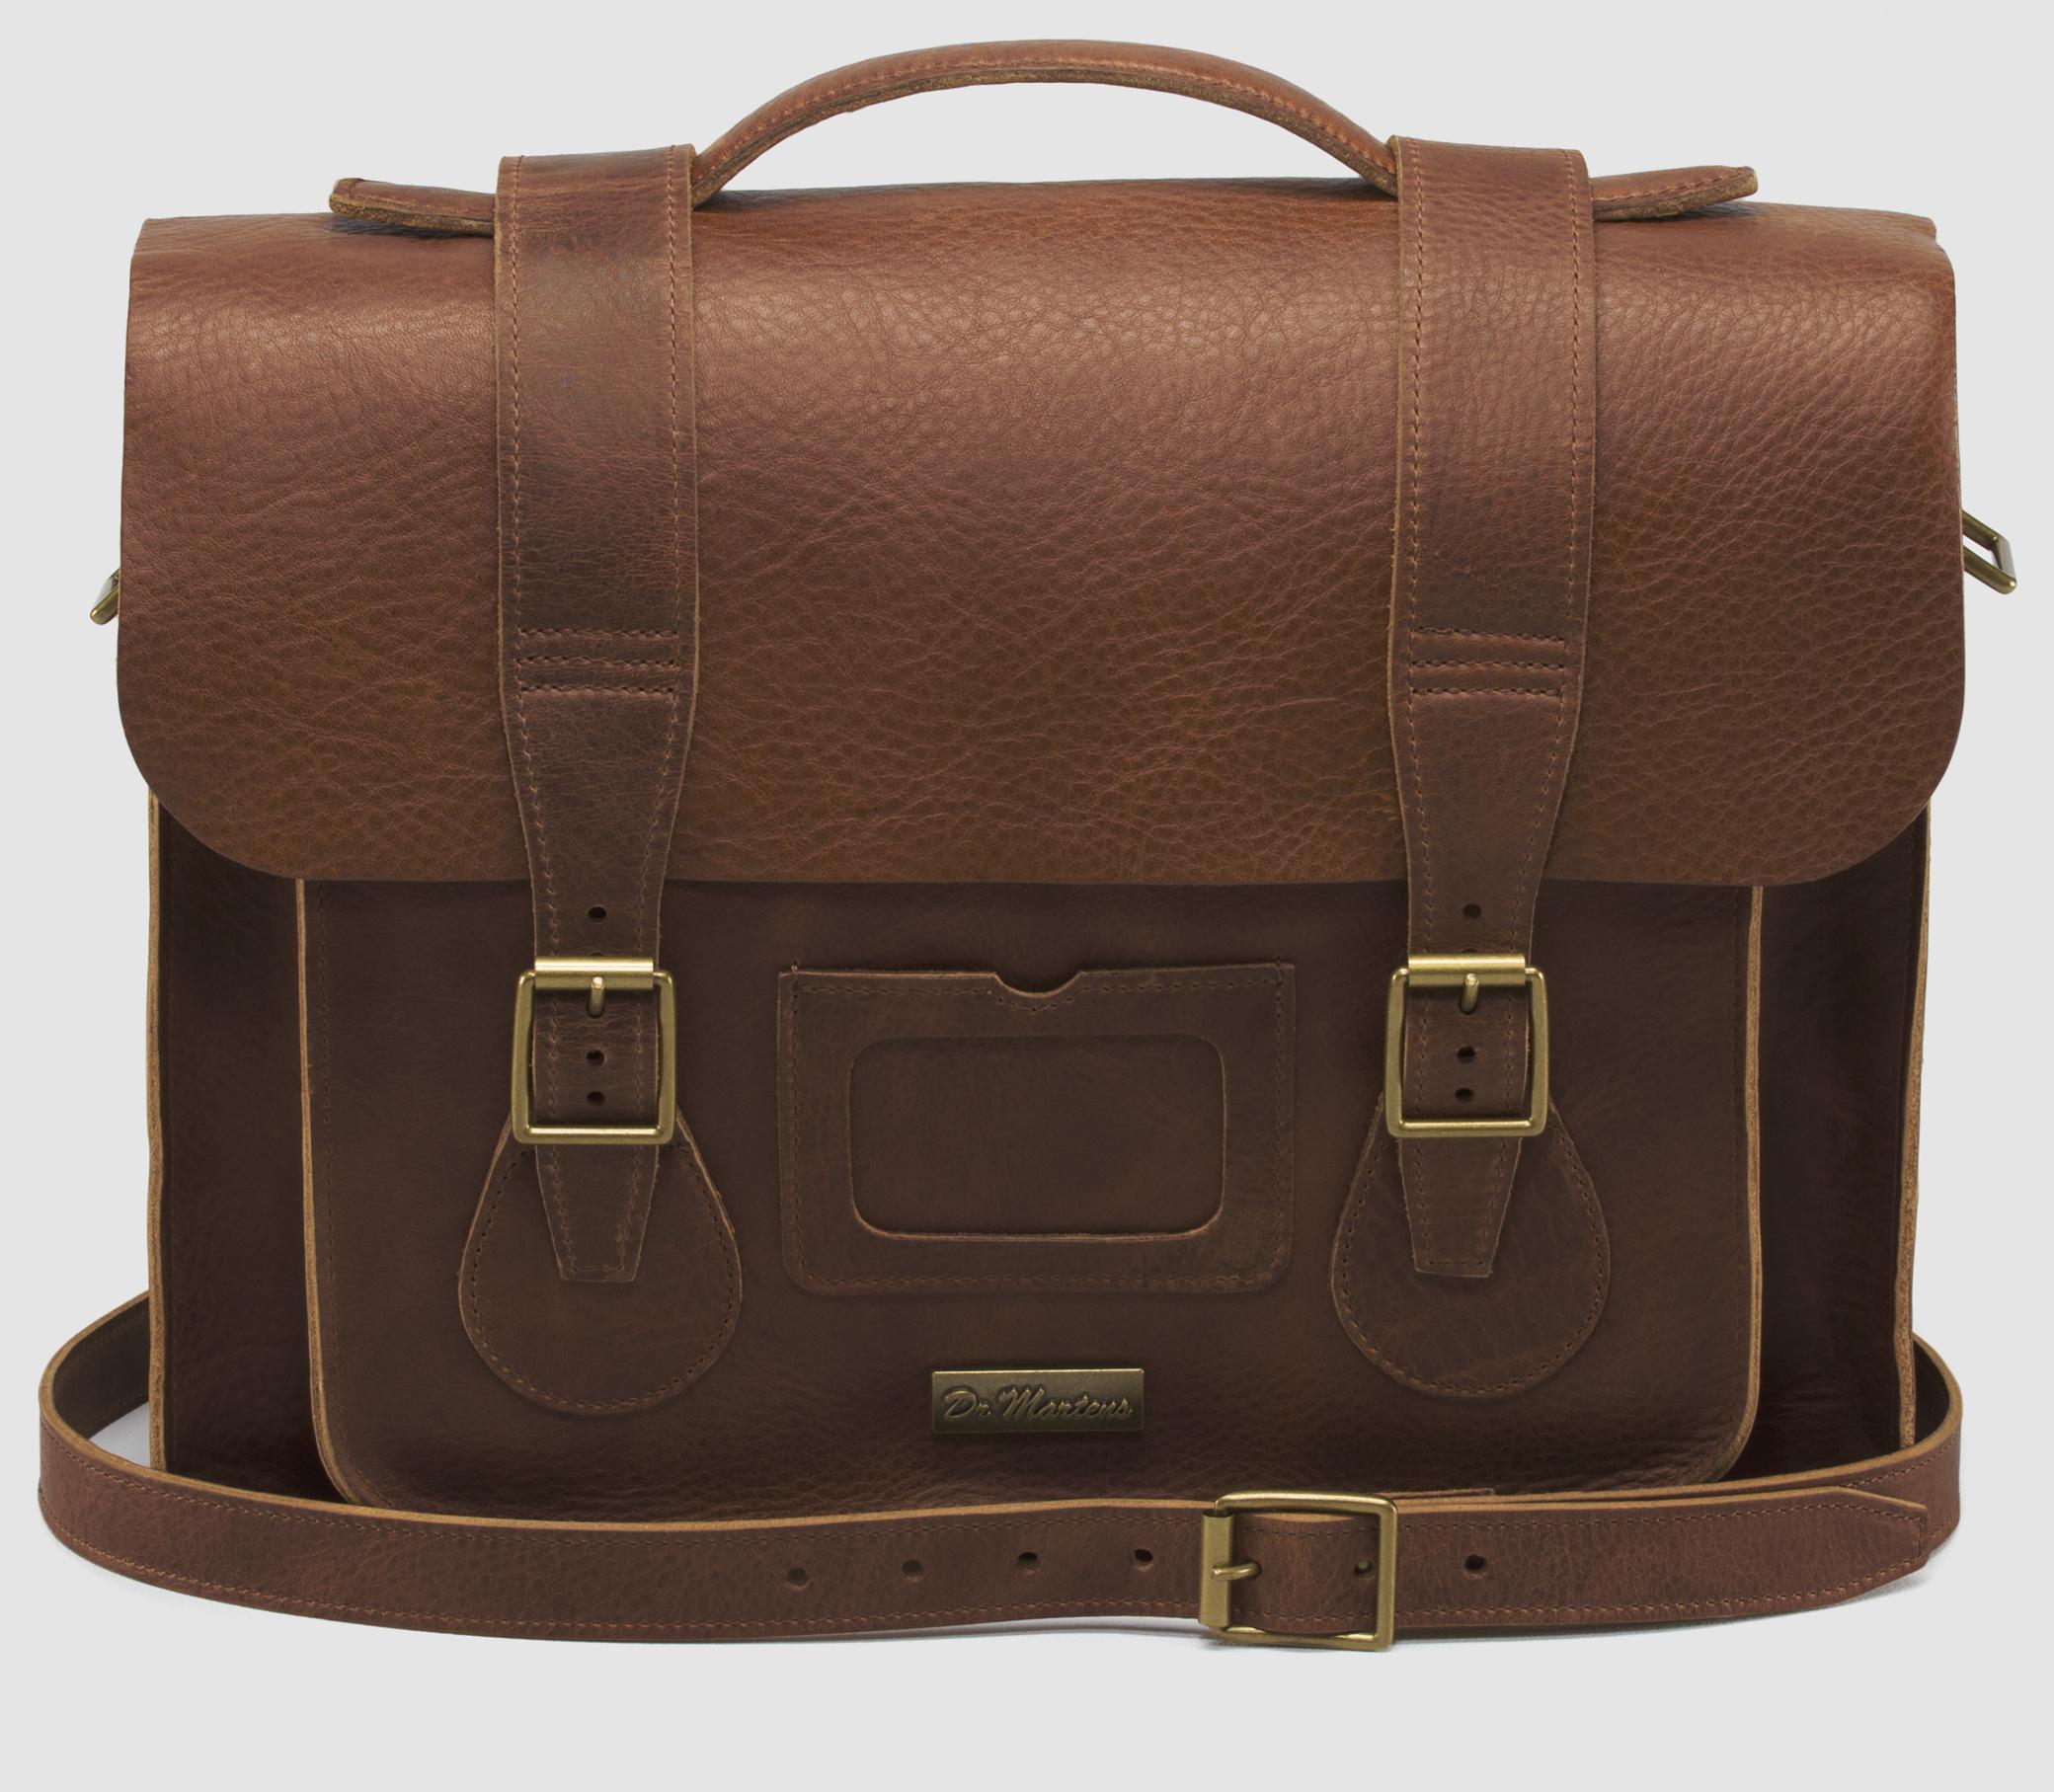 15 leather satchel accessoires taschen official dr. Black Bedroom Furniture Sets. Home Design Ideas